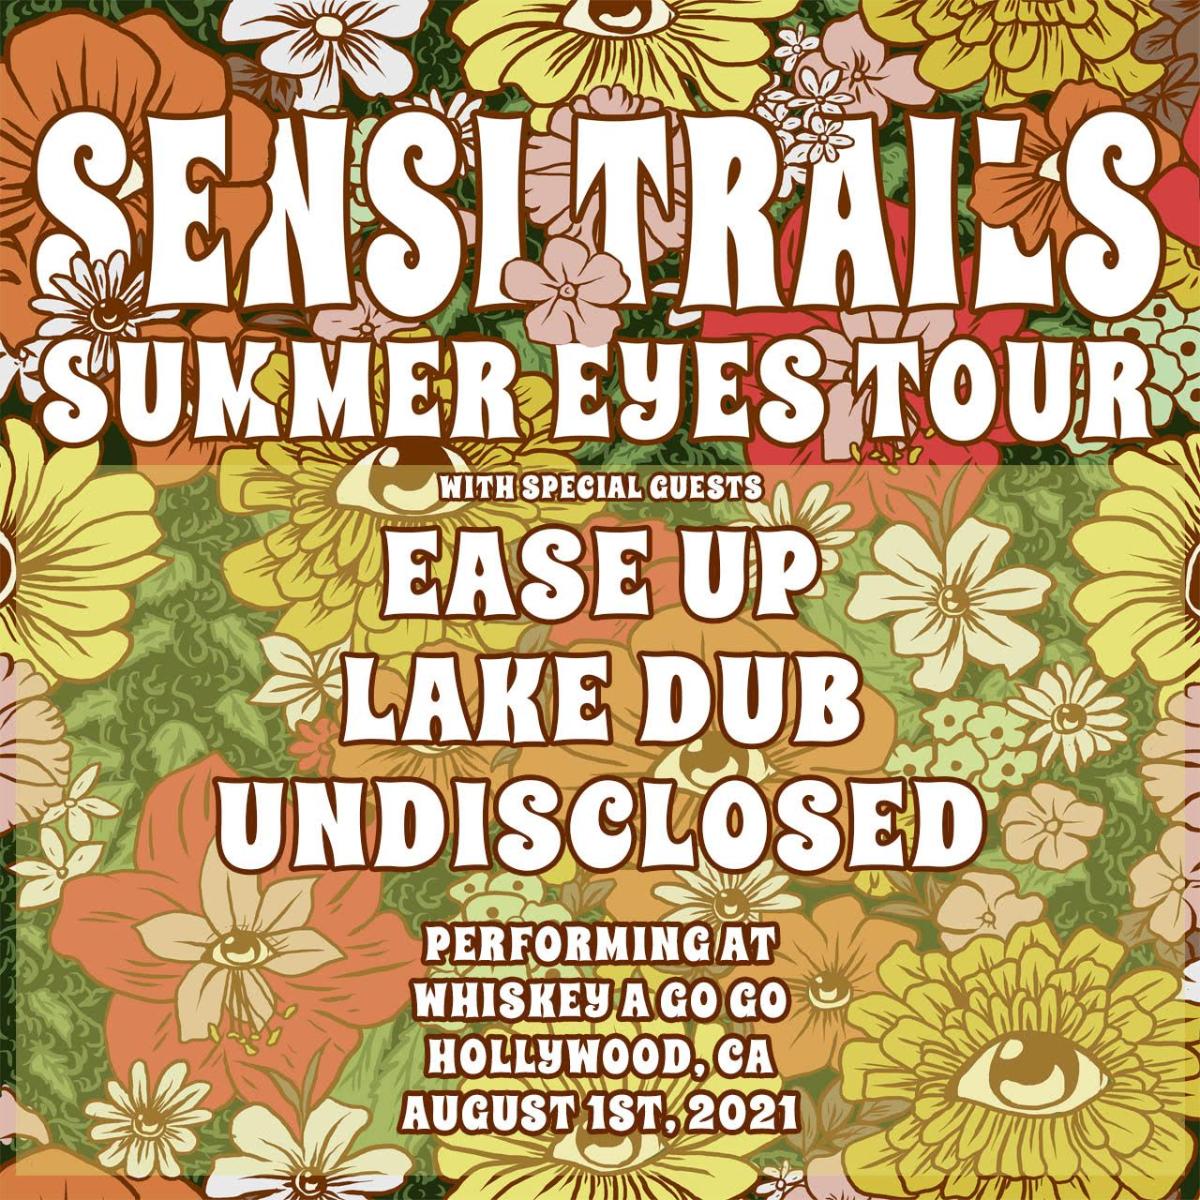 Sensi Trails, Ease Up, Lake Dub, Undisclosed